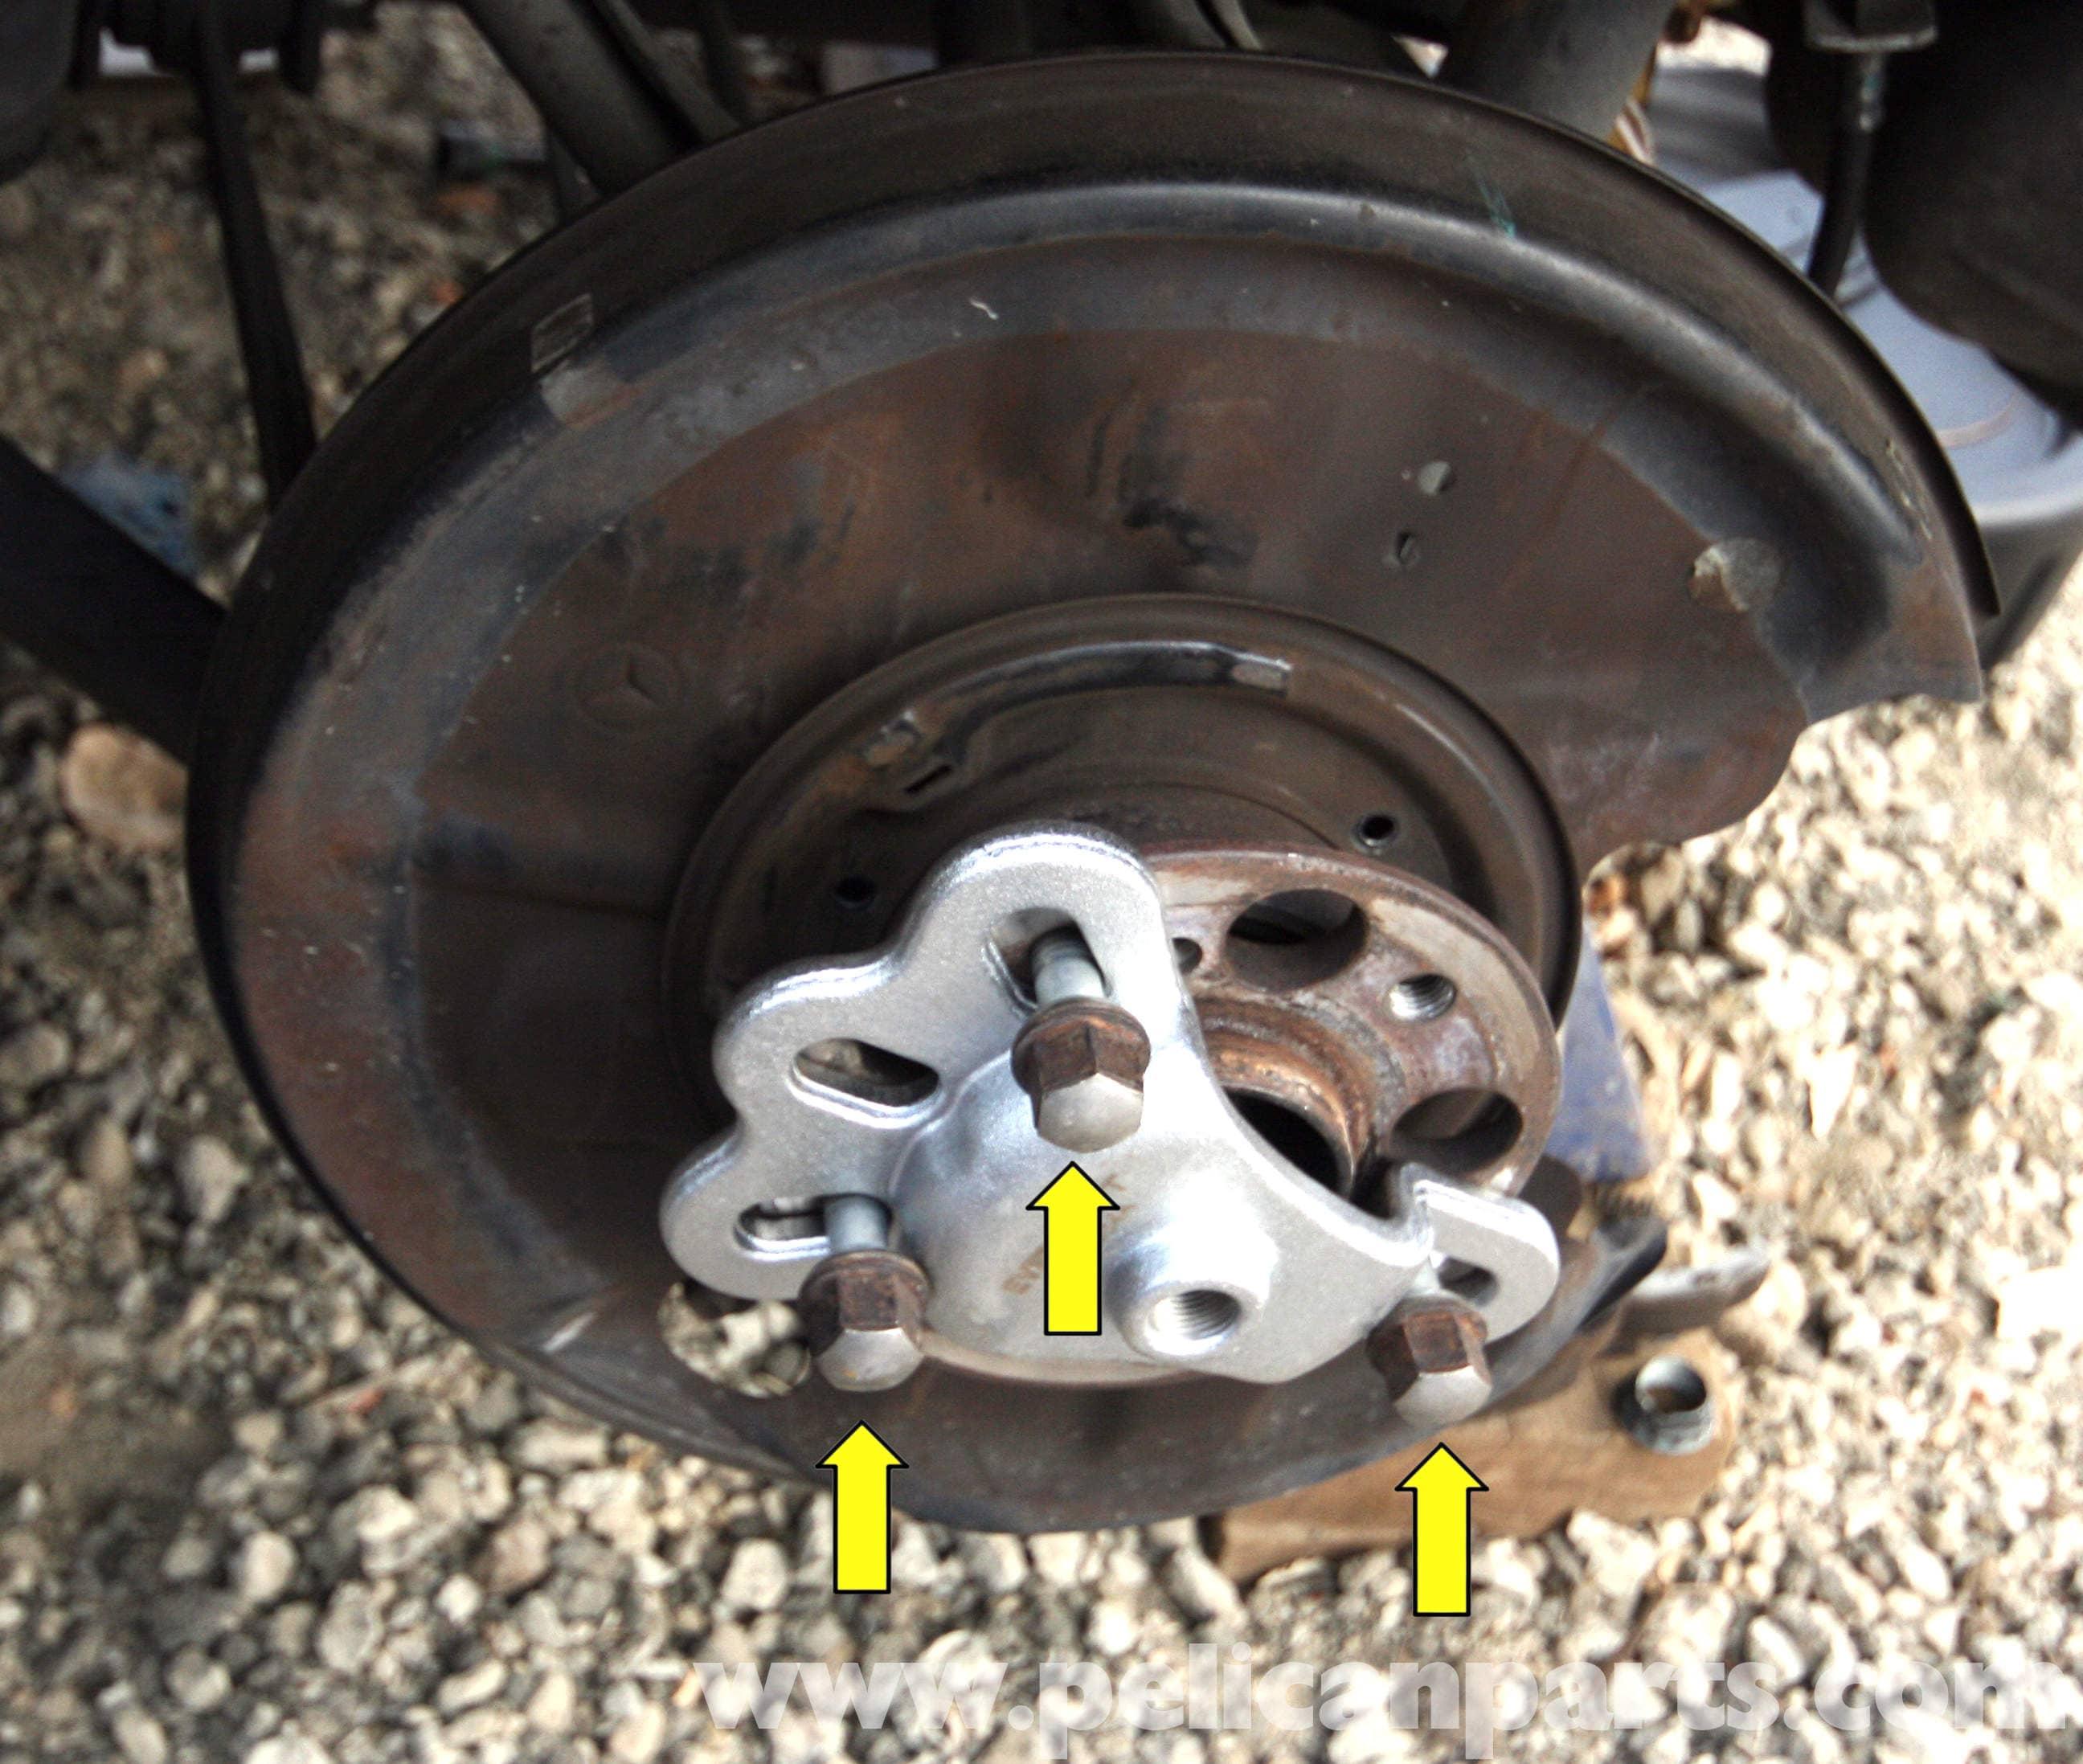 Mercedes-Benz SLK 230 Rear Wheel Hub Removal